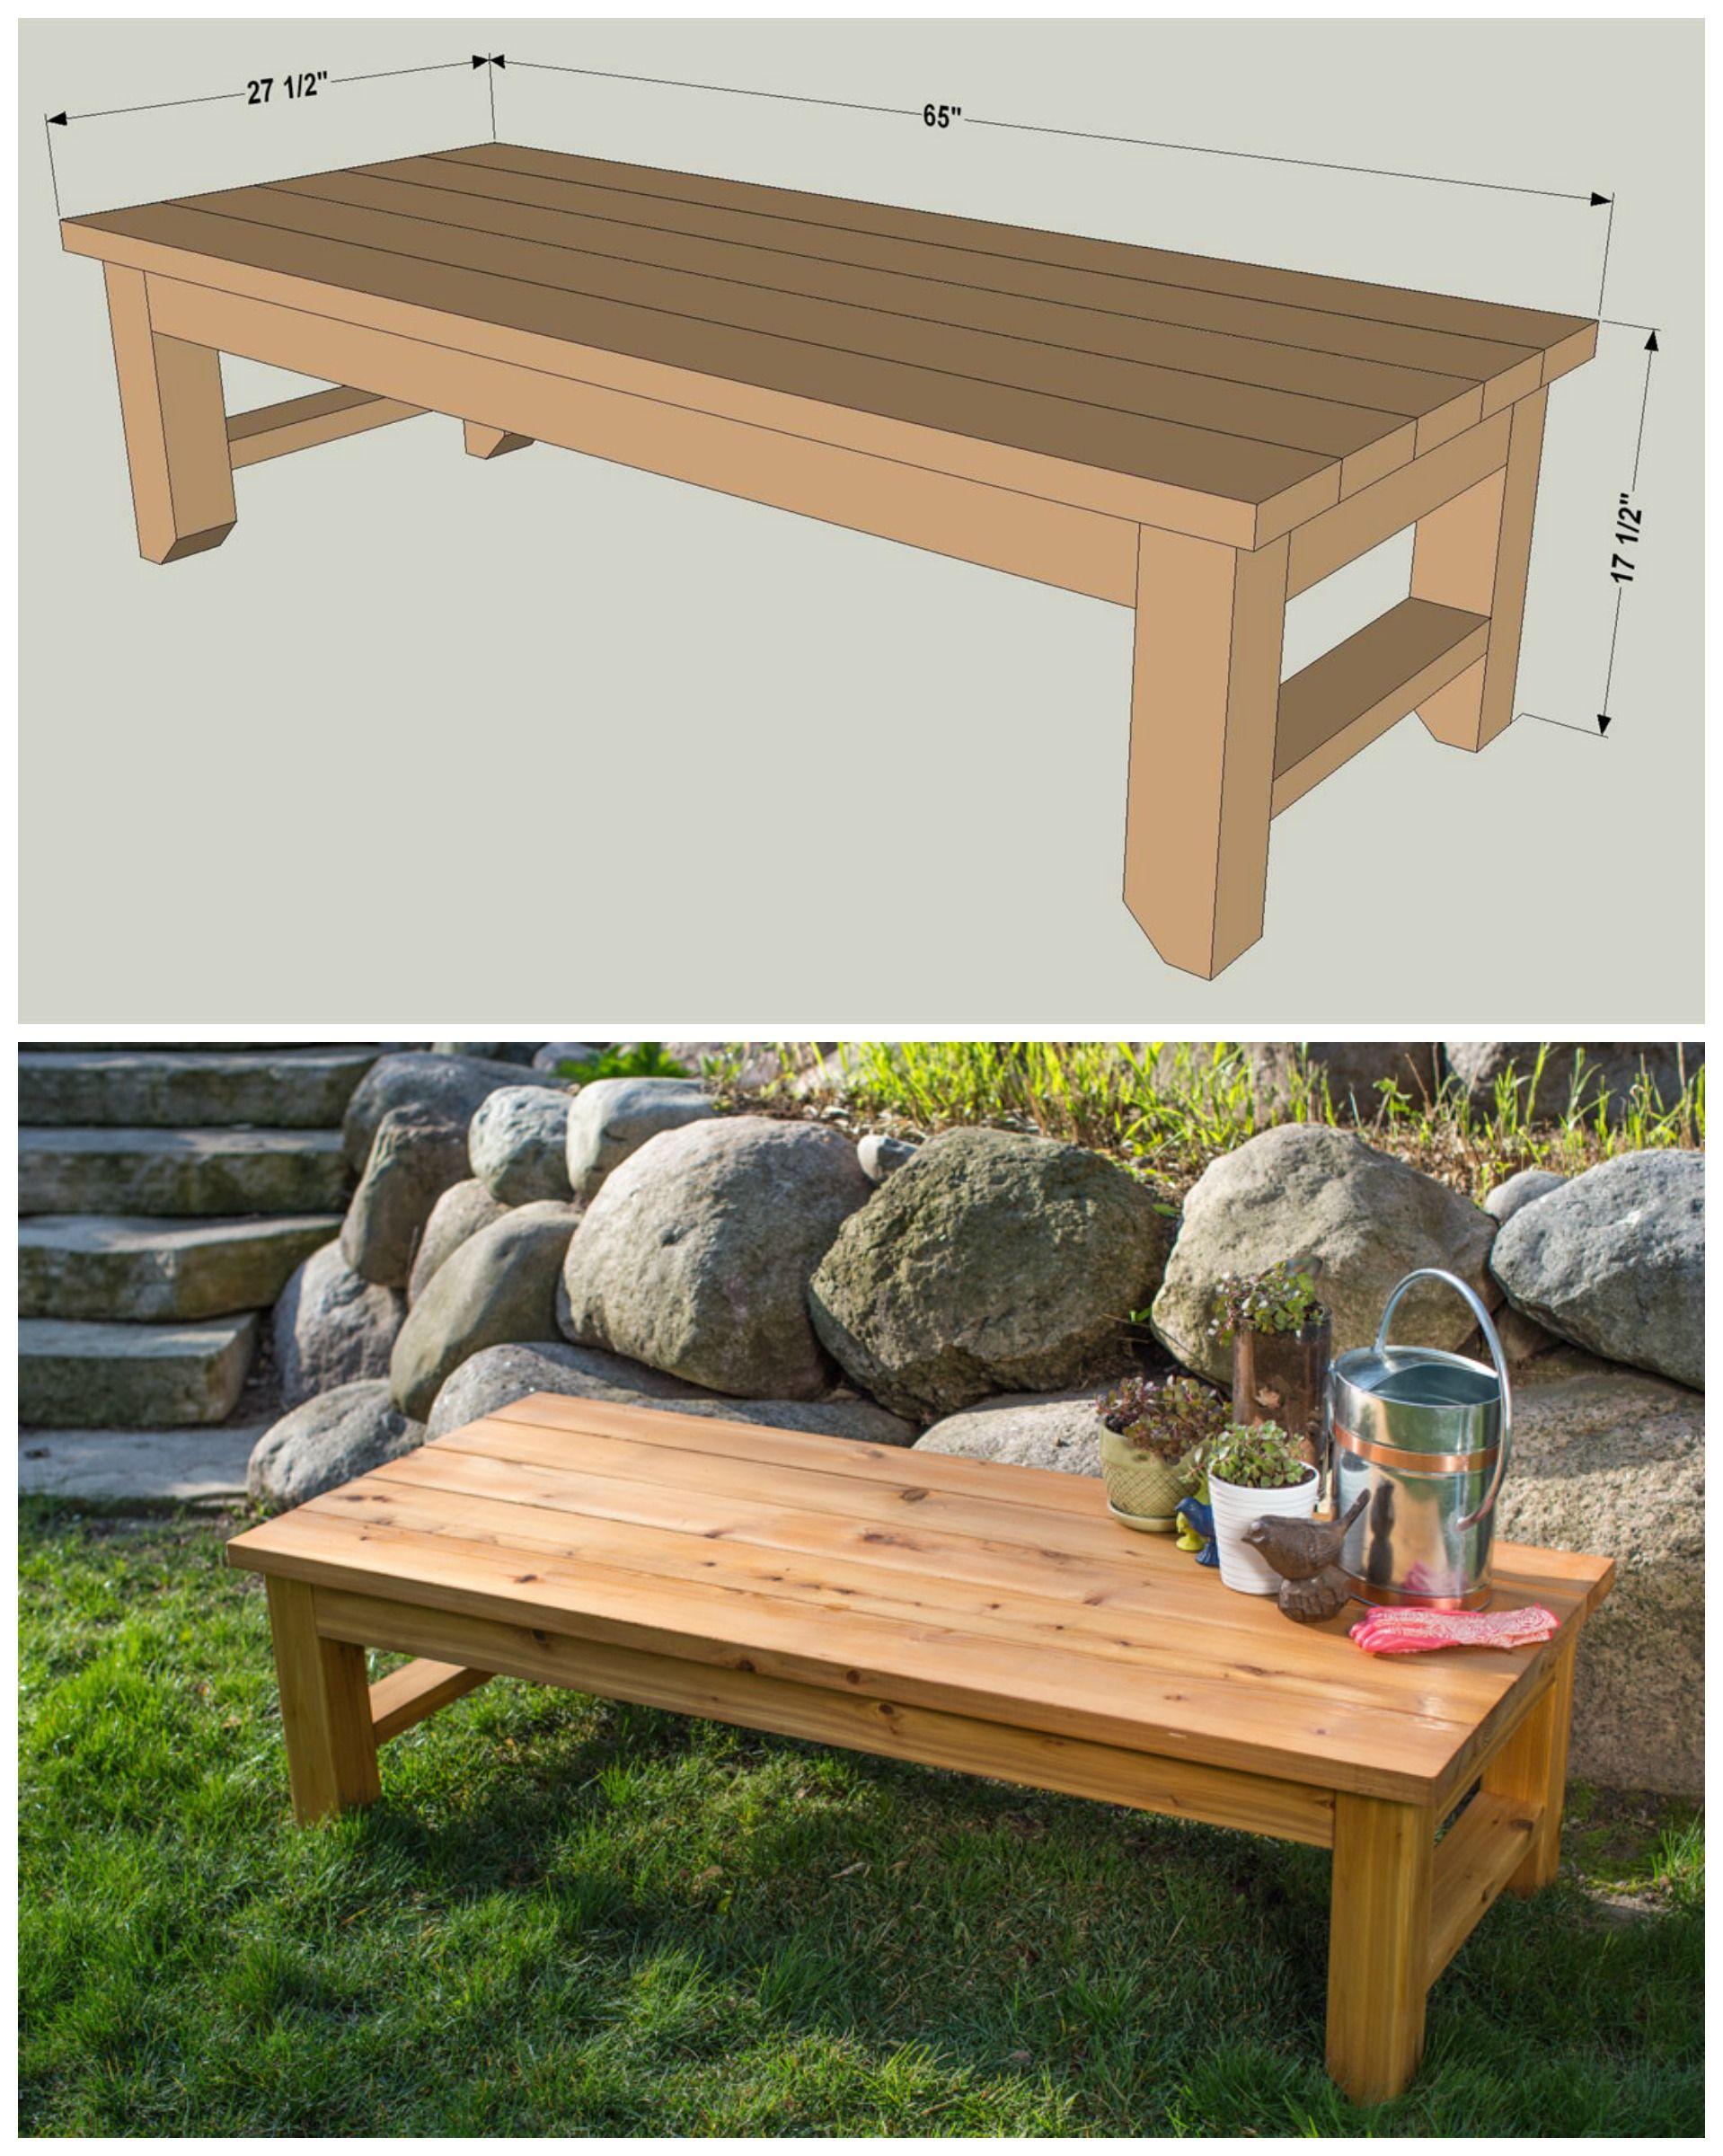 Diy Cedar Bench Free Plans At Buildsomething Com Outdoor Furniture Plans Cedar Bench Wooden Bench Diy